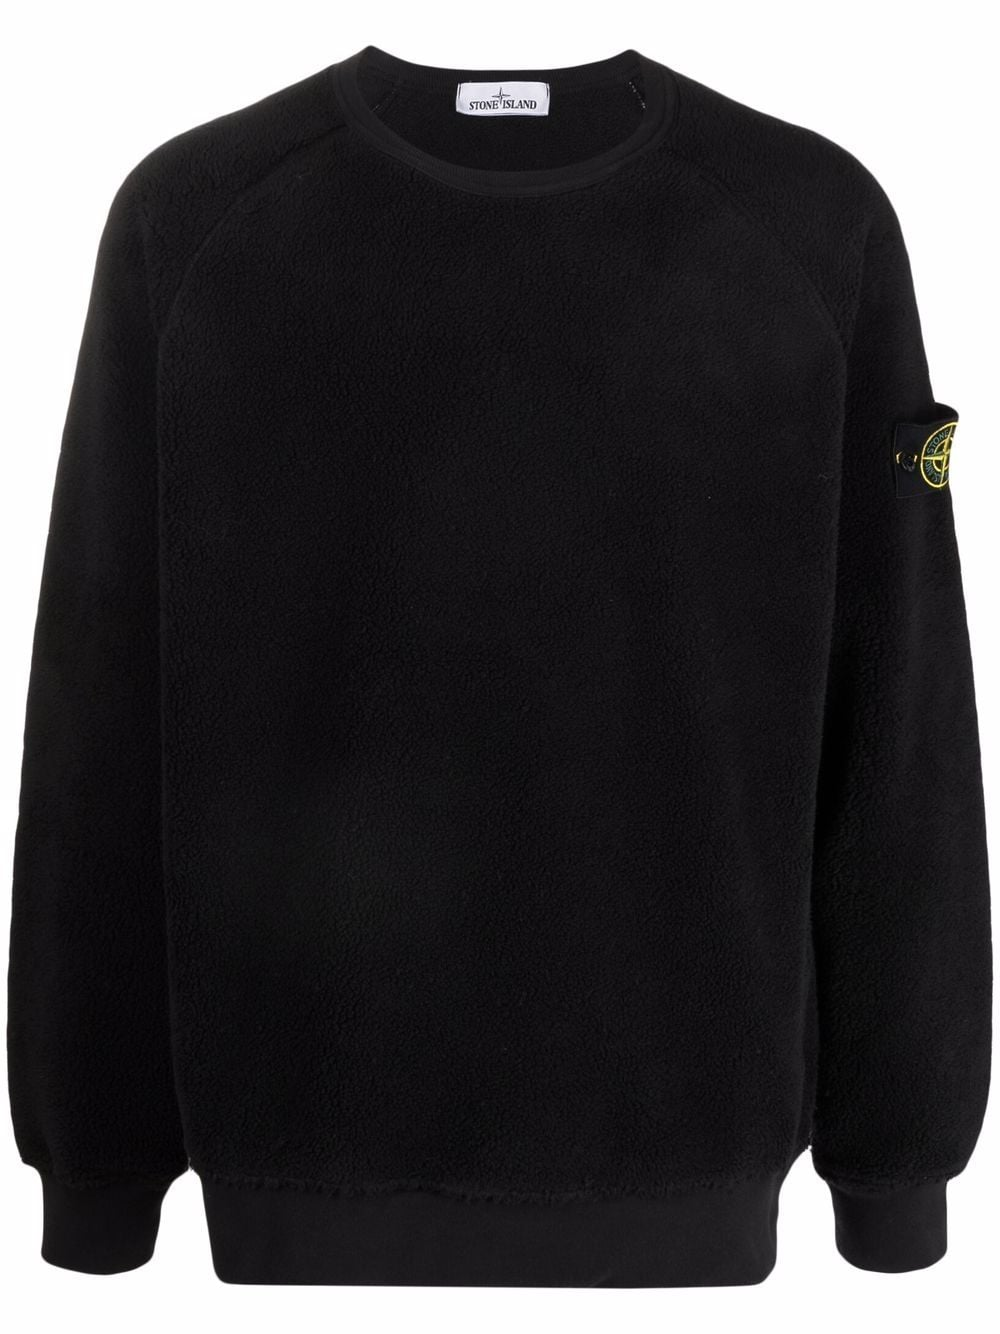 <p class='small-title'>STONE ISLAND</p>Crew Neck Sweatshirt